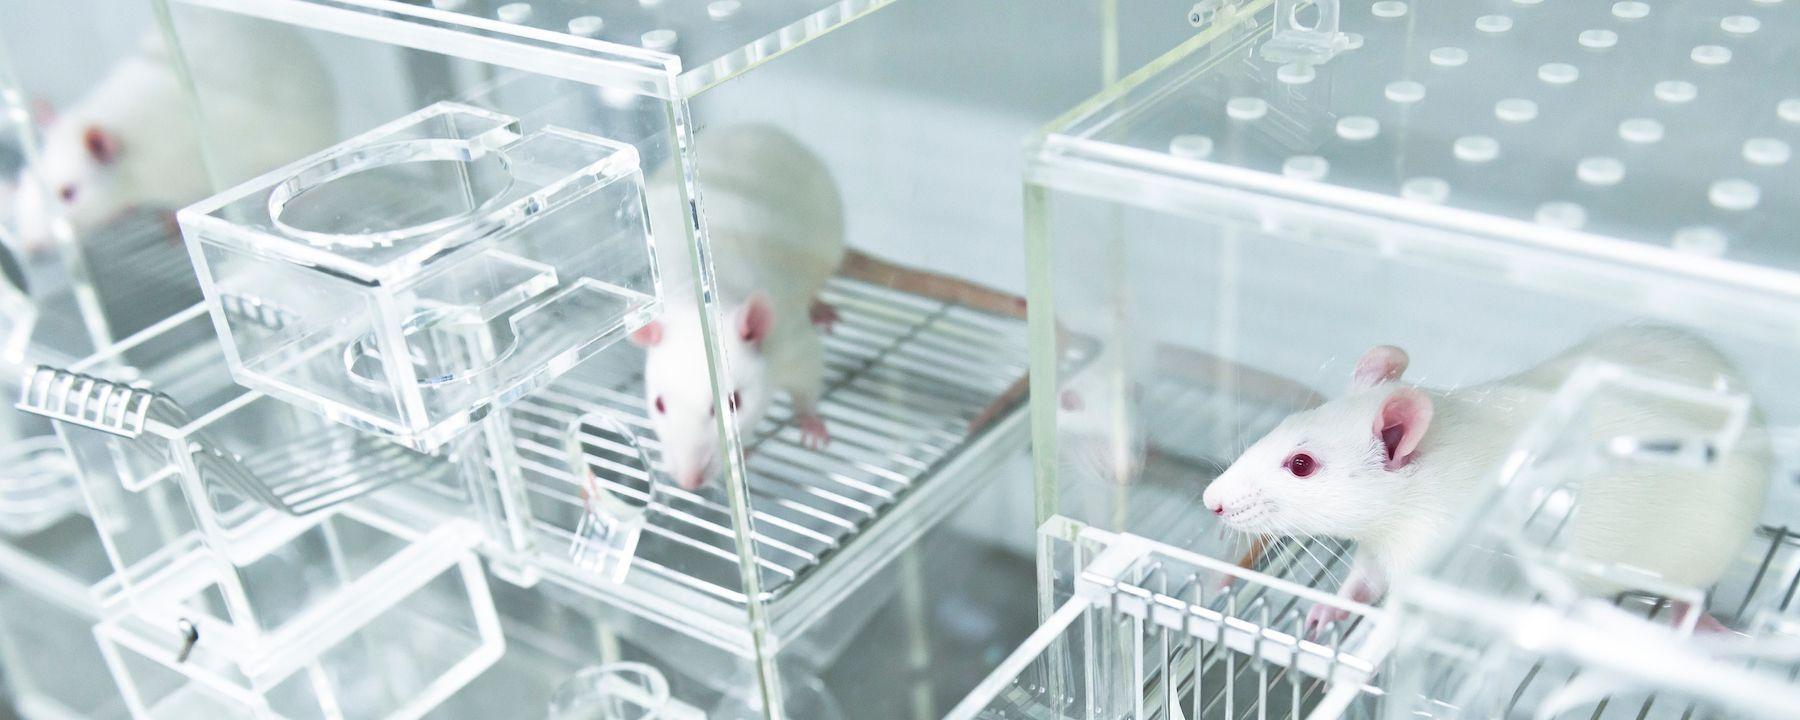 EPA Aims to Drastically Reduce Animal Testing